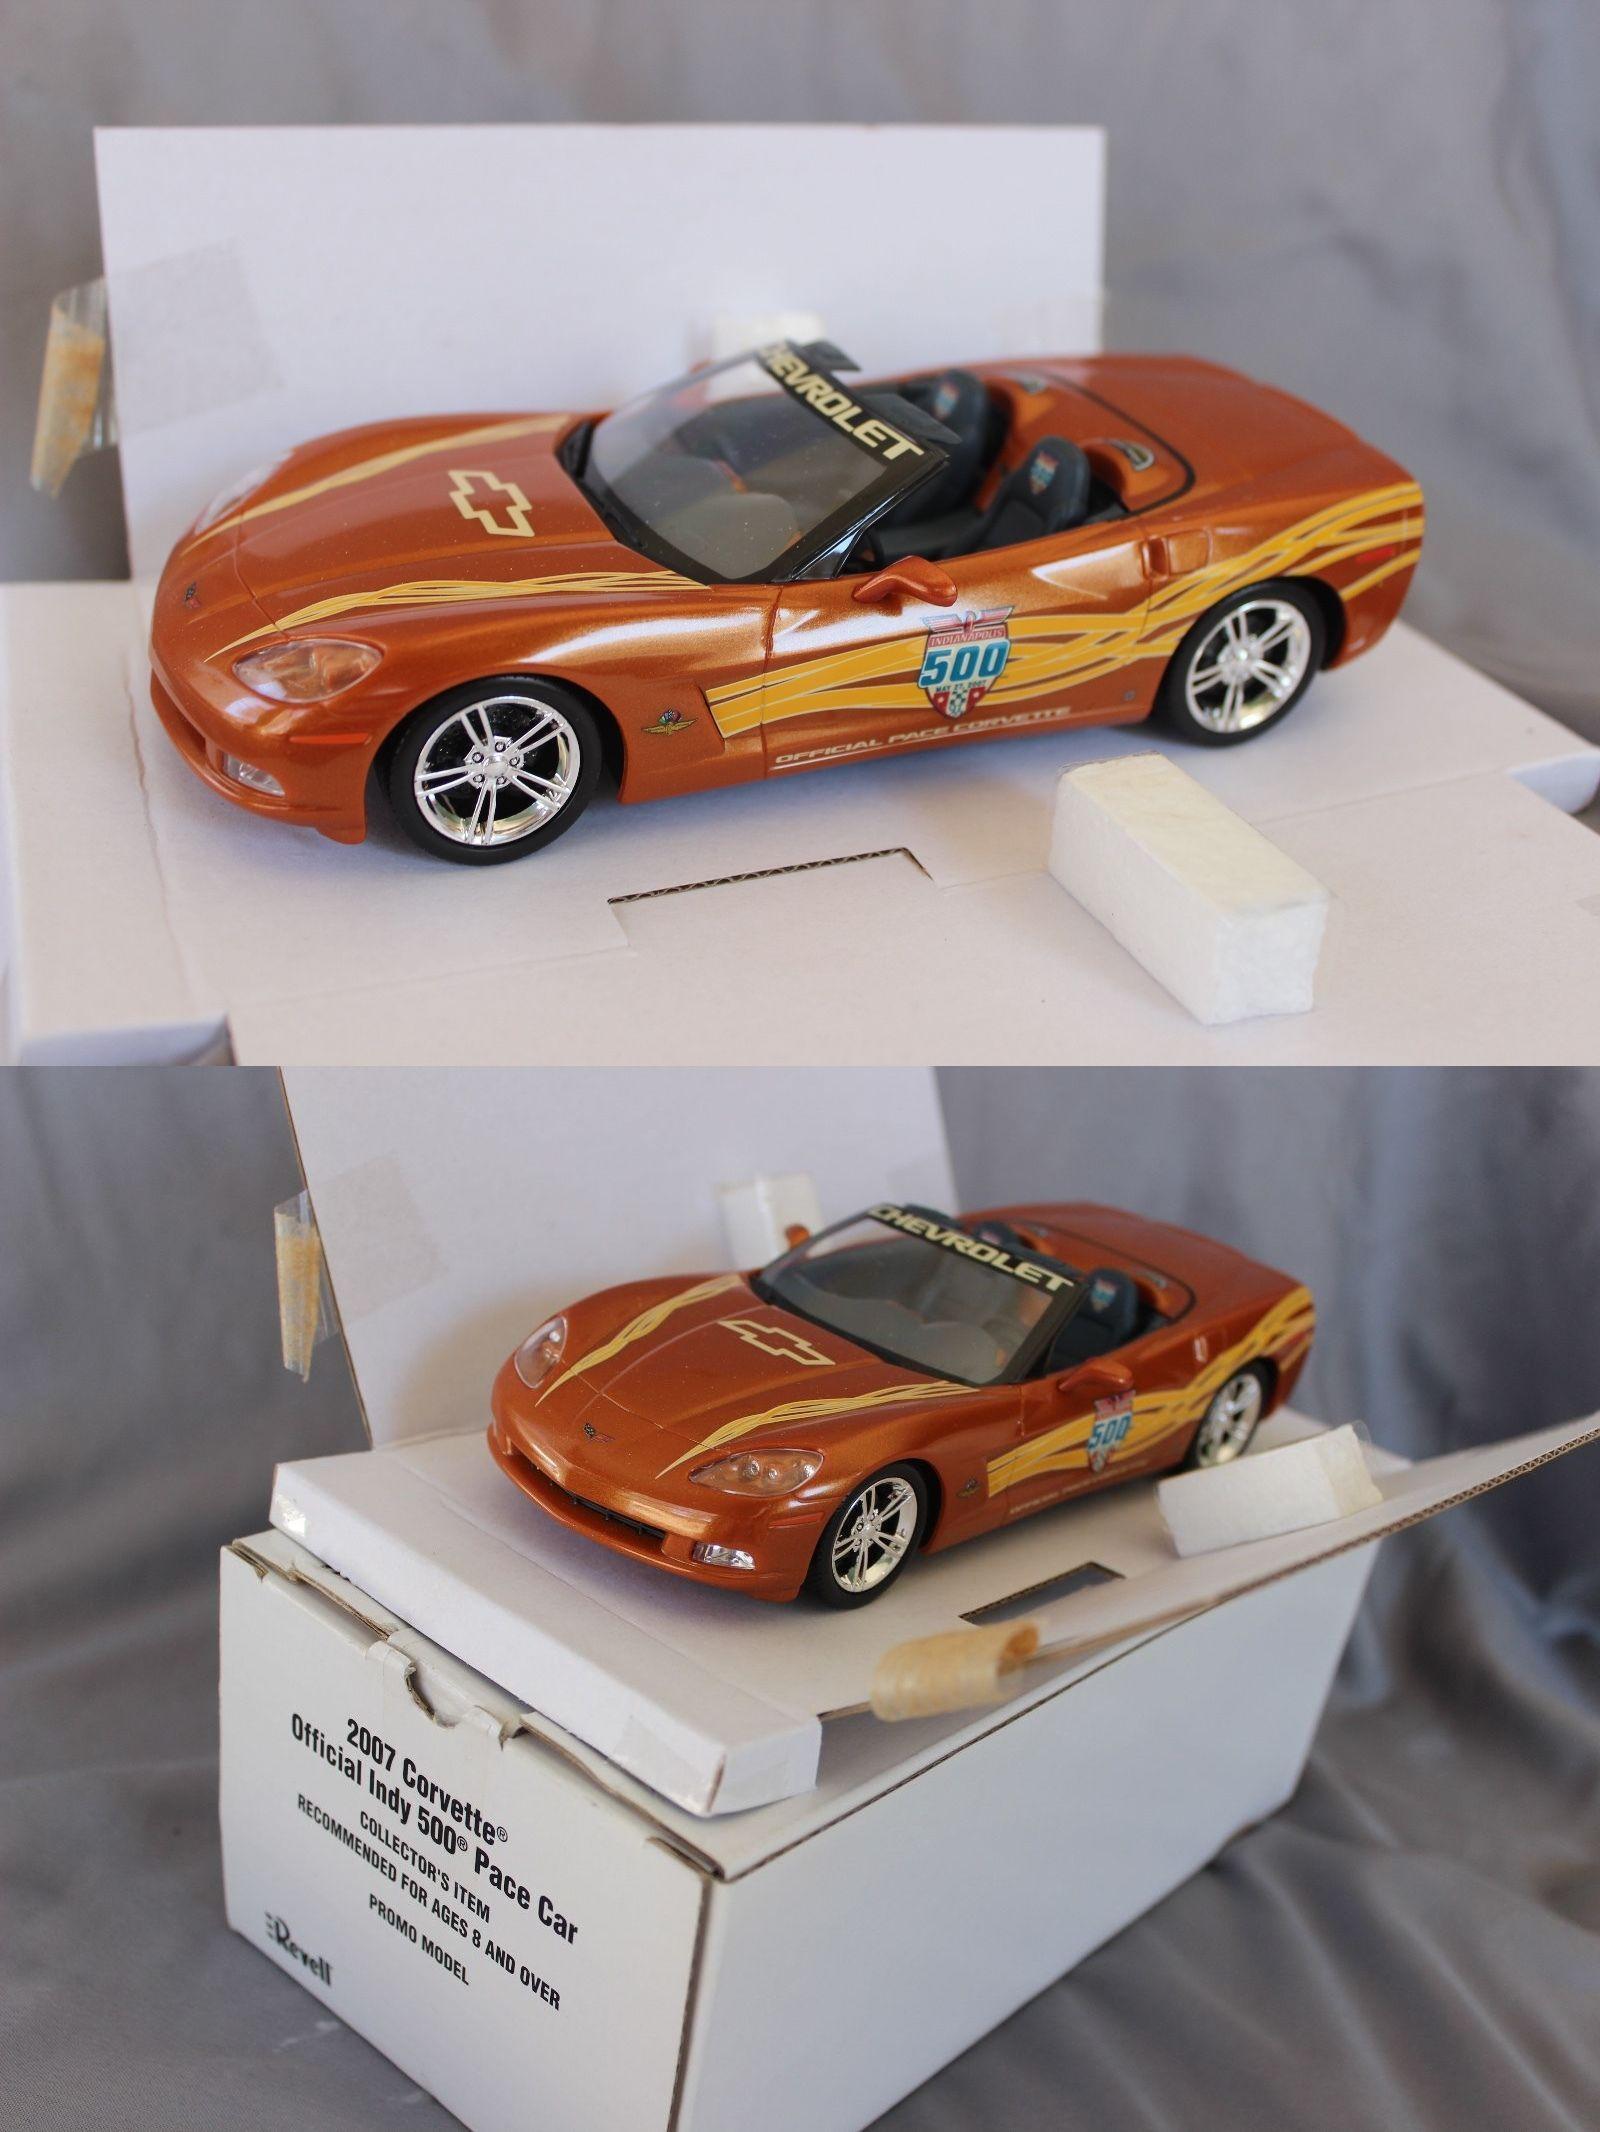 Promo 2592 revell 2007 corvette indy pace car promo model mib buy it